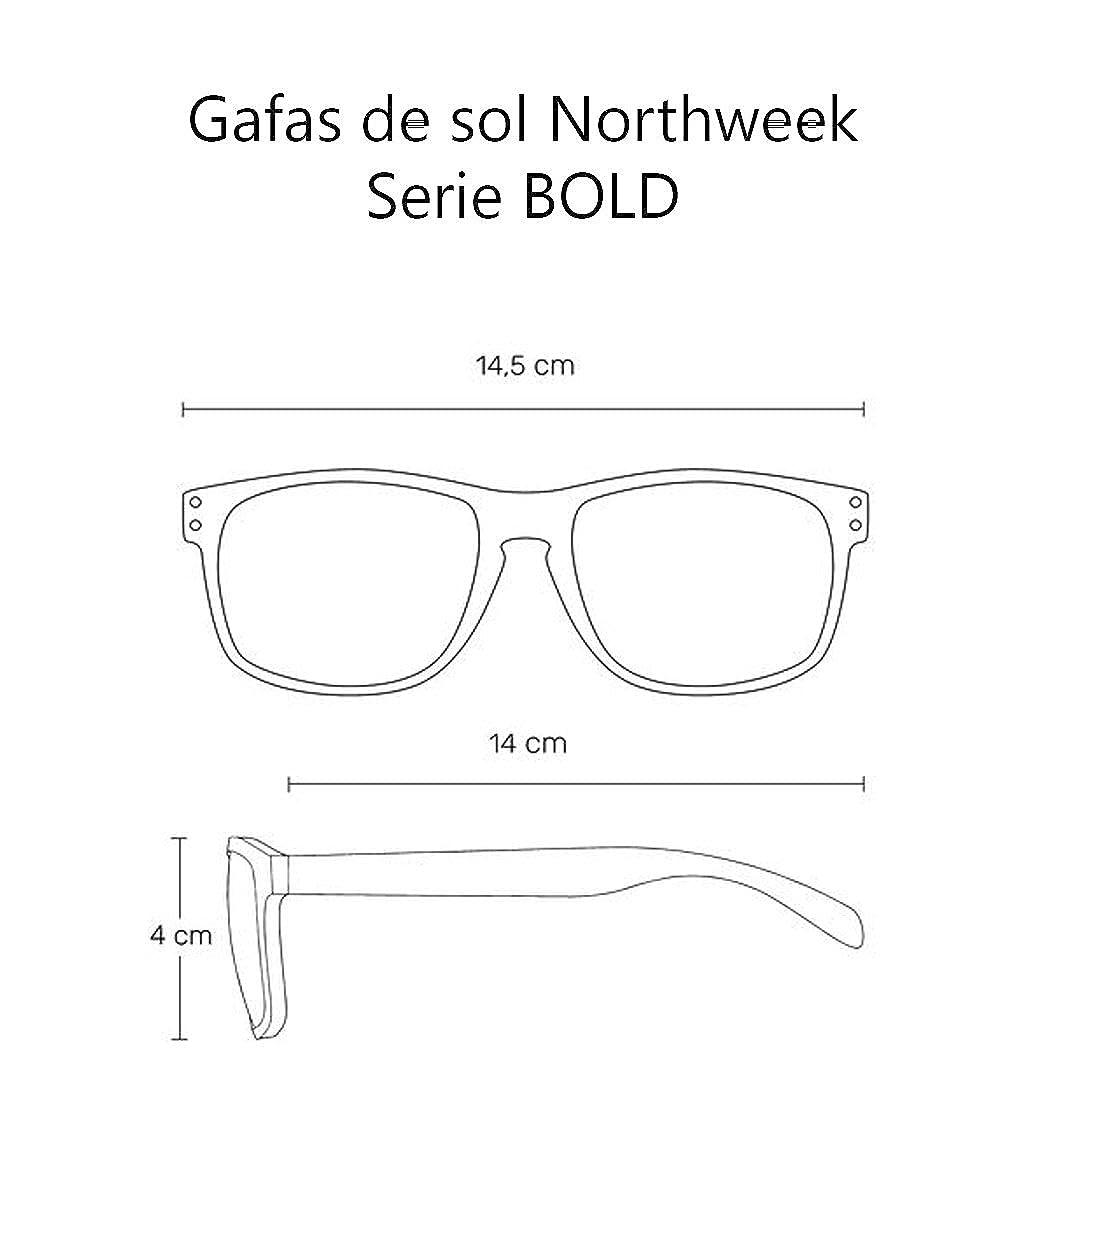 Gafas Sol Sunglasses UNISEX Northweek SERIE BOLD GRADIANT AZUL - lente AZUL POLARIZADA: Amazon.es: Ropa y accesorios